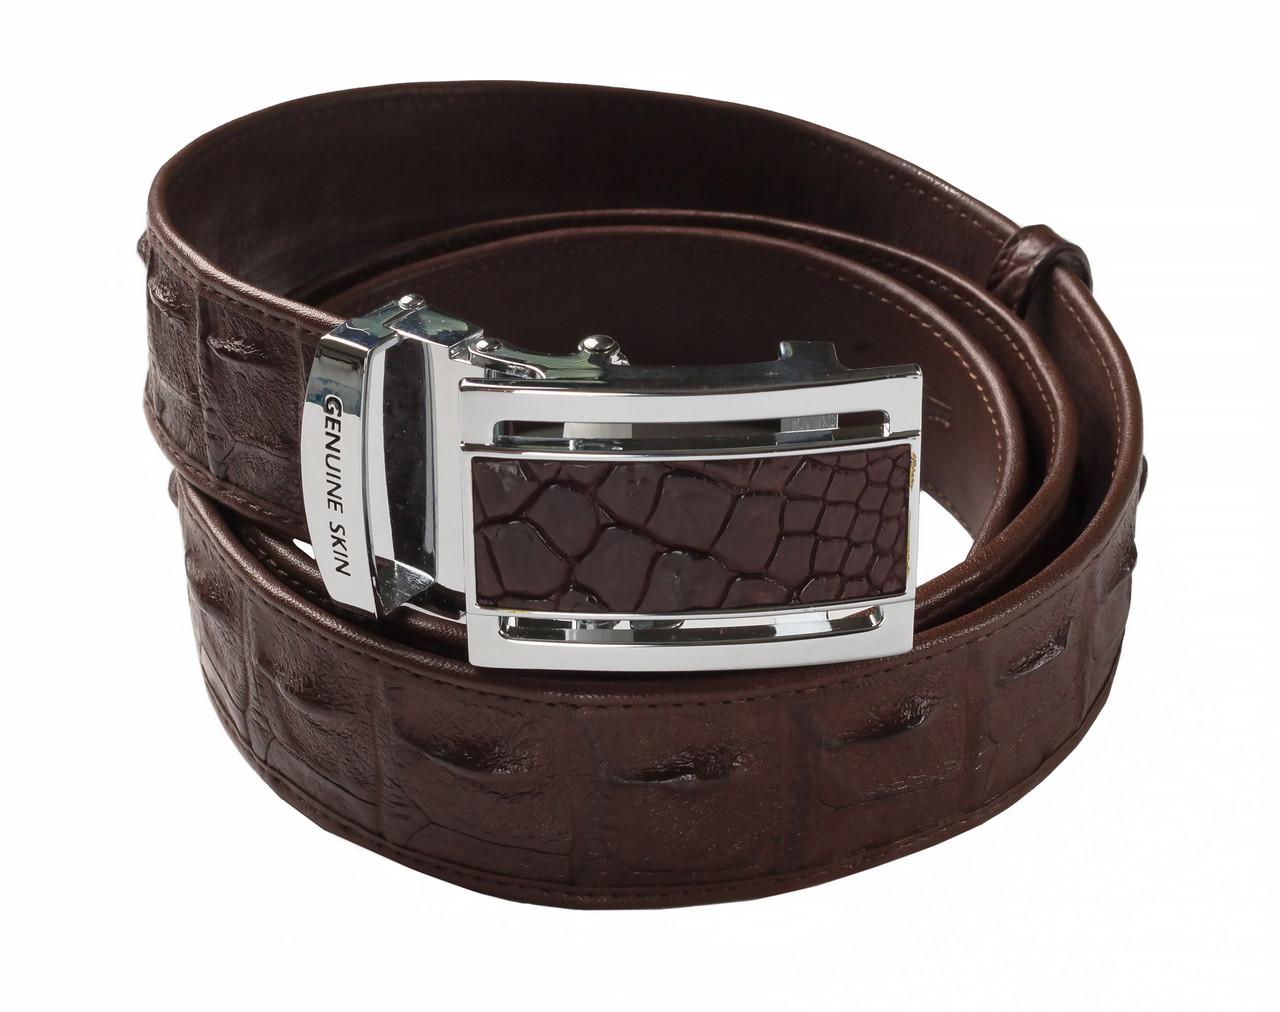 Ремень из кожи крокодила  Ekzotic Leather  Темно - коричневый (crb08)